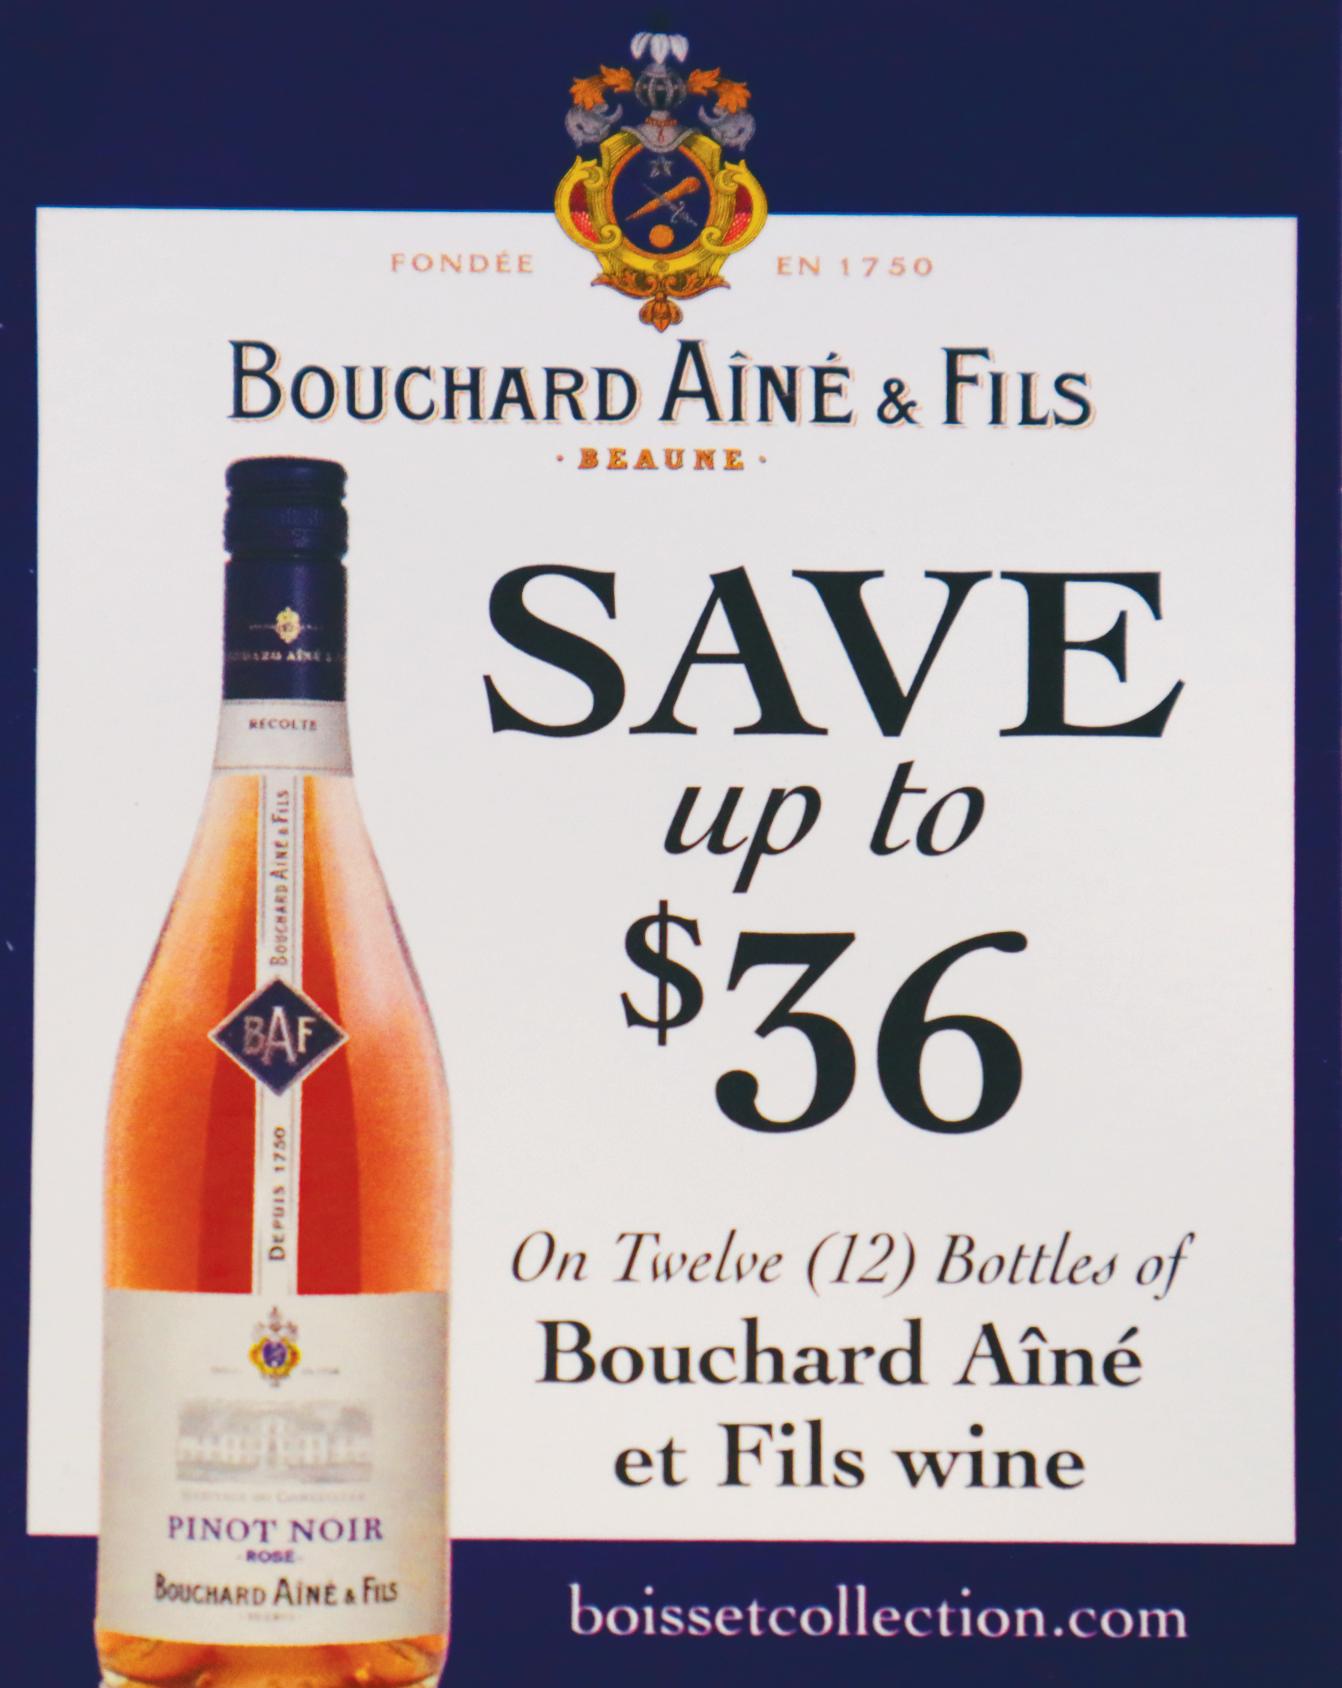 Bouchard Aine et Fils Wine